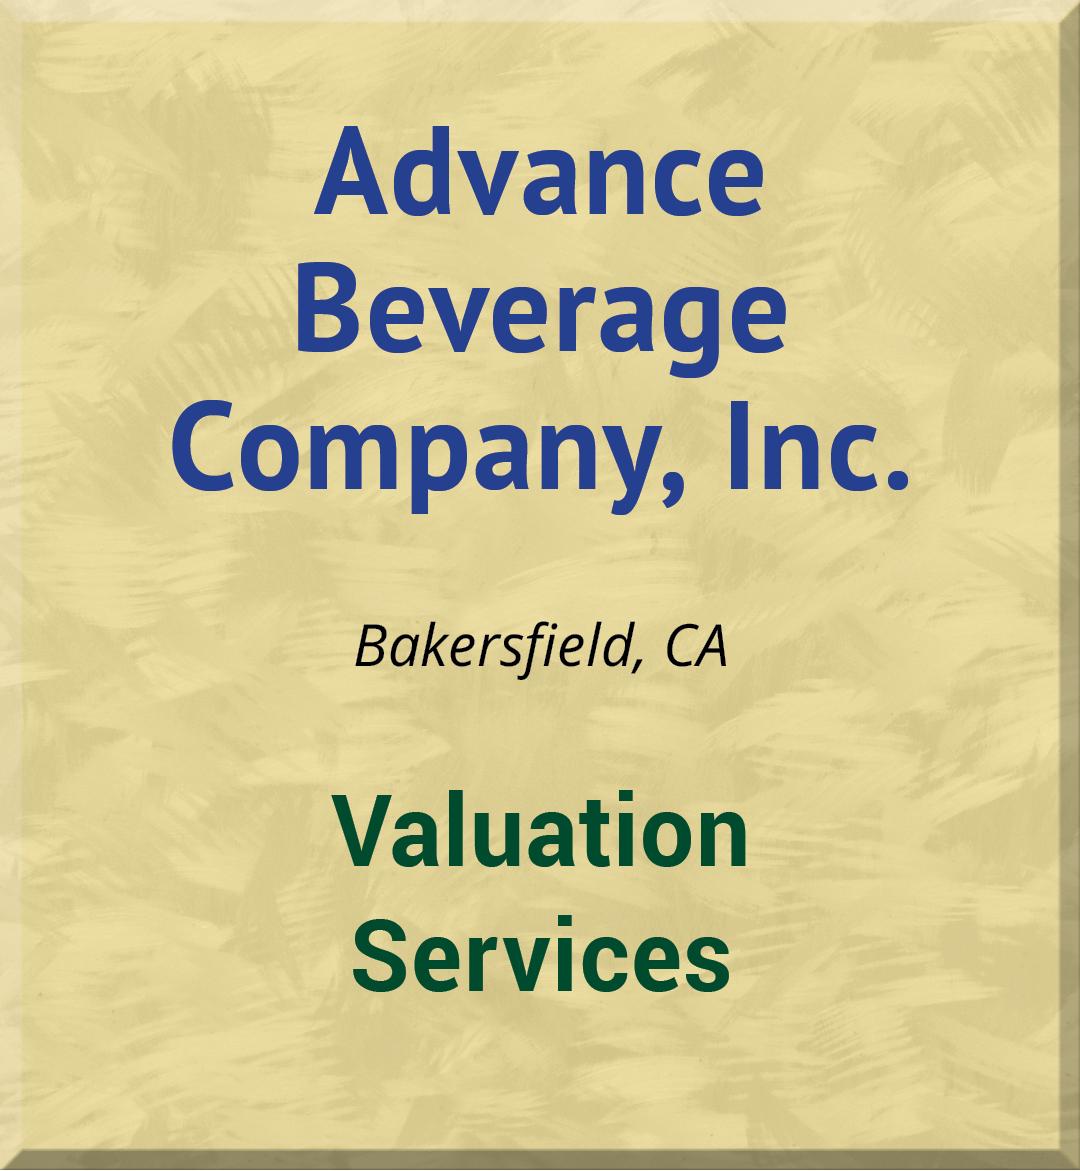 Advance Beverage Company, Inc.